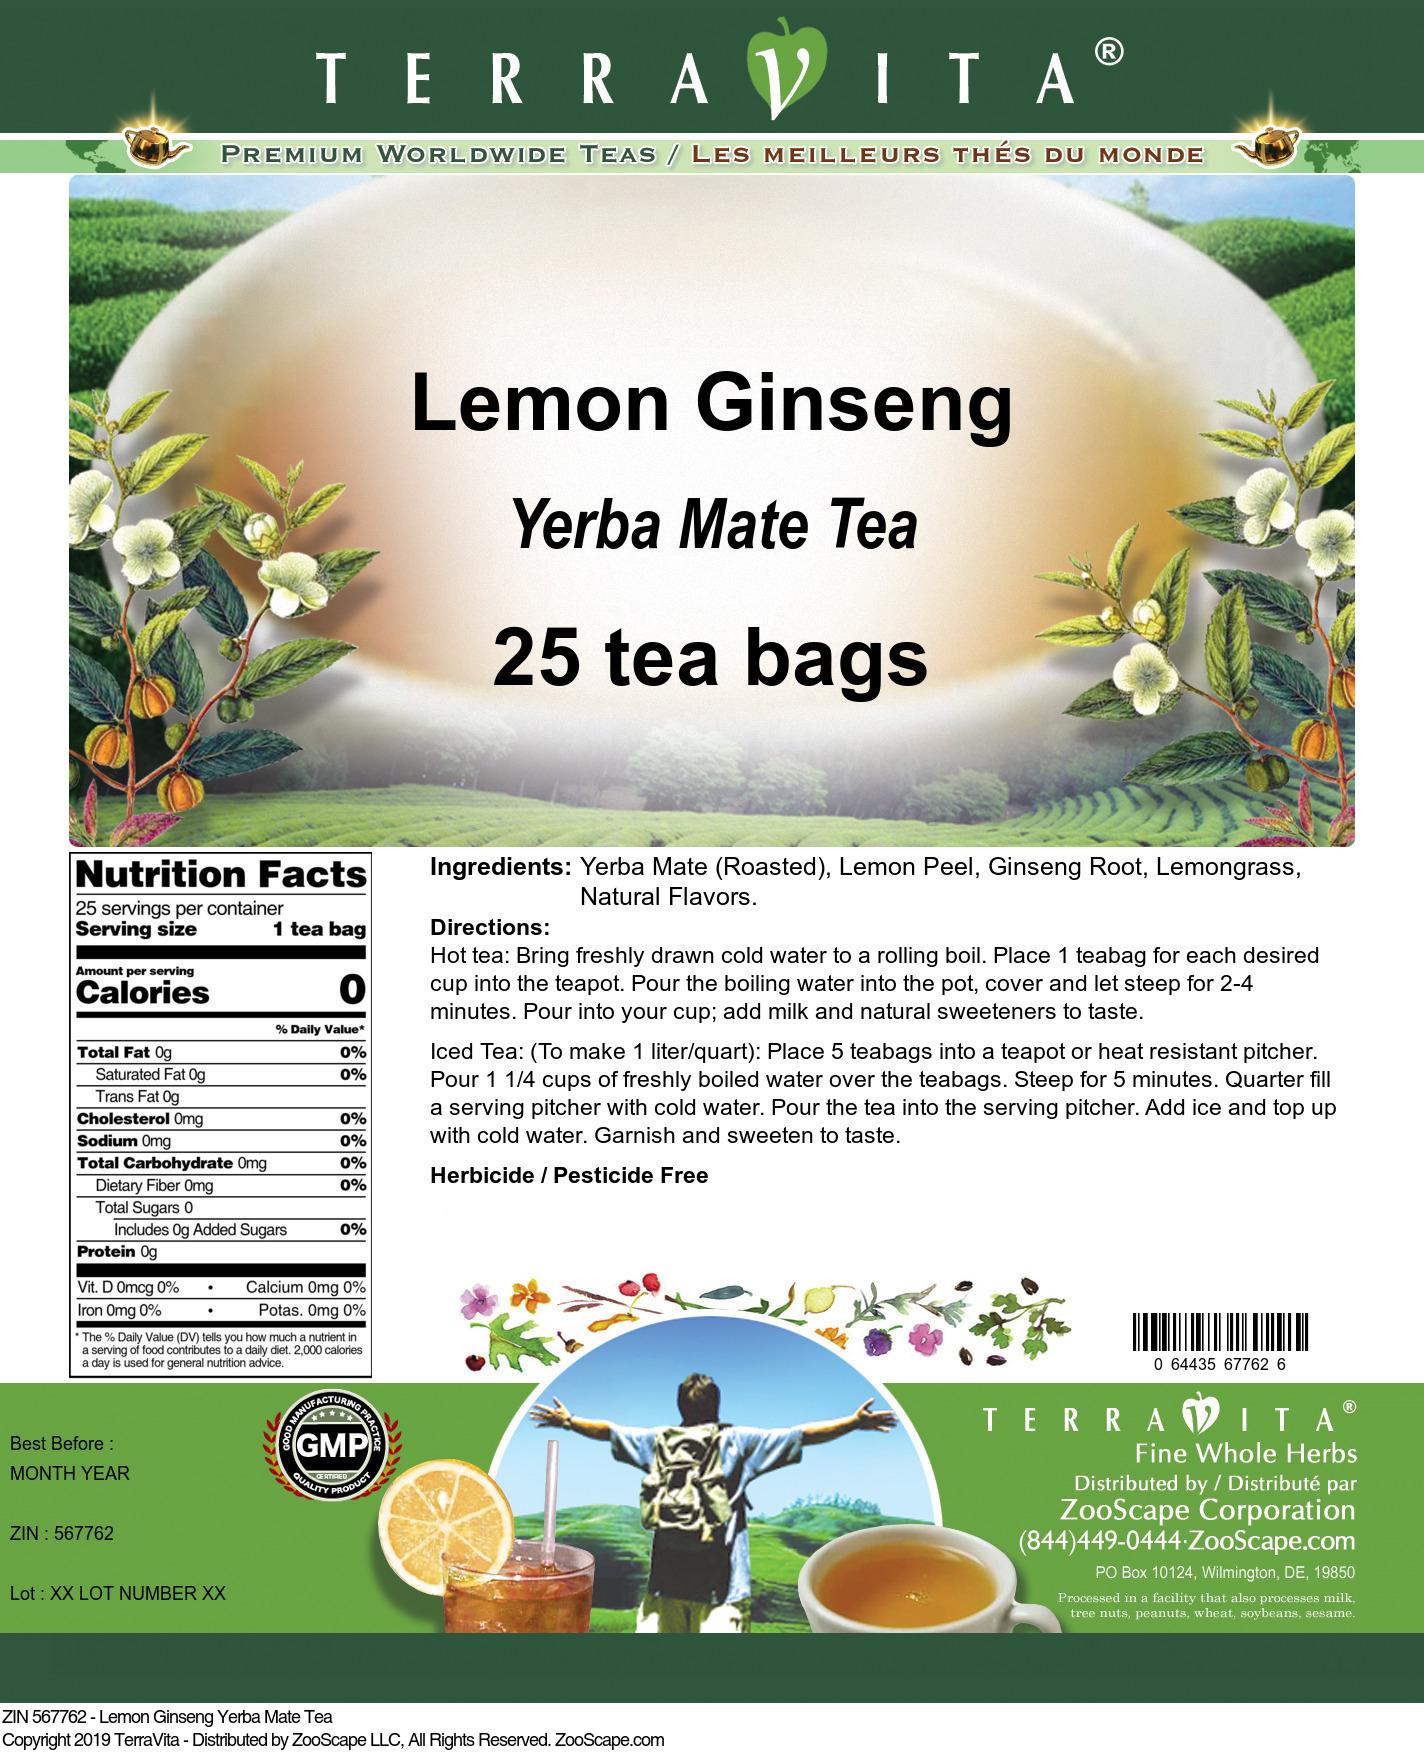 Lemon Ginseng Yerba Mate Tea